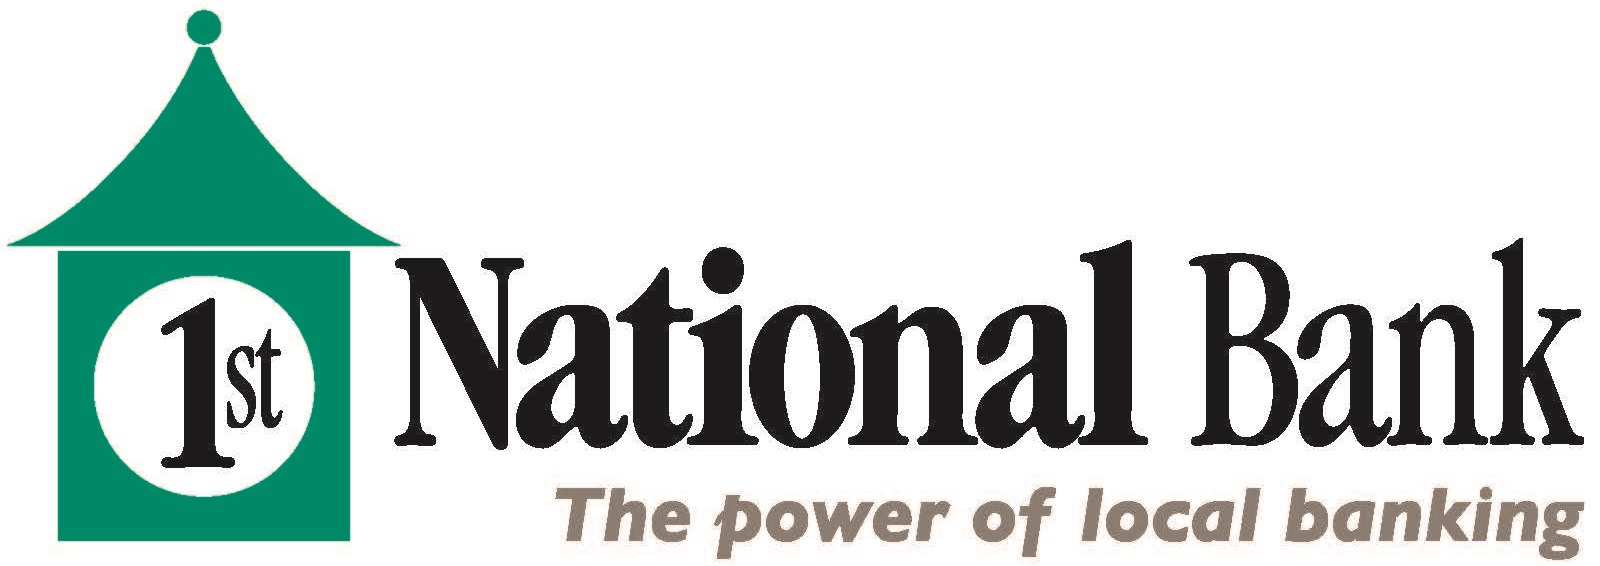 First national bank brighton logo